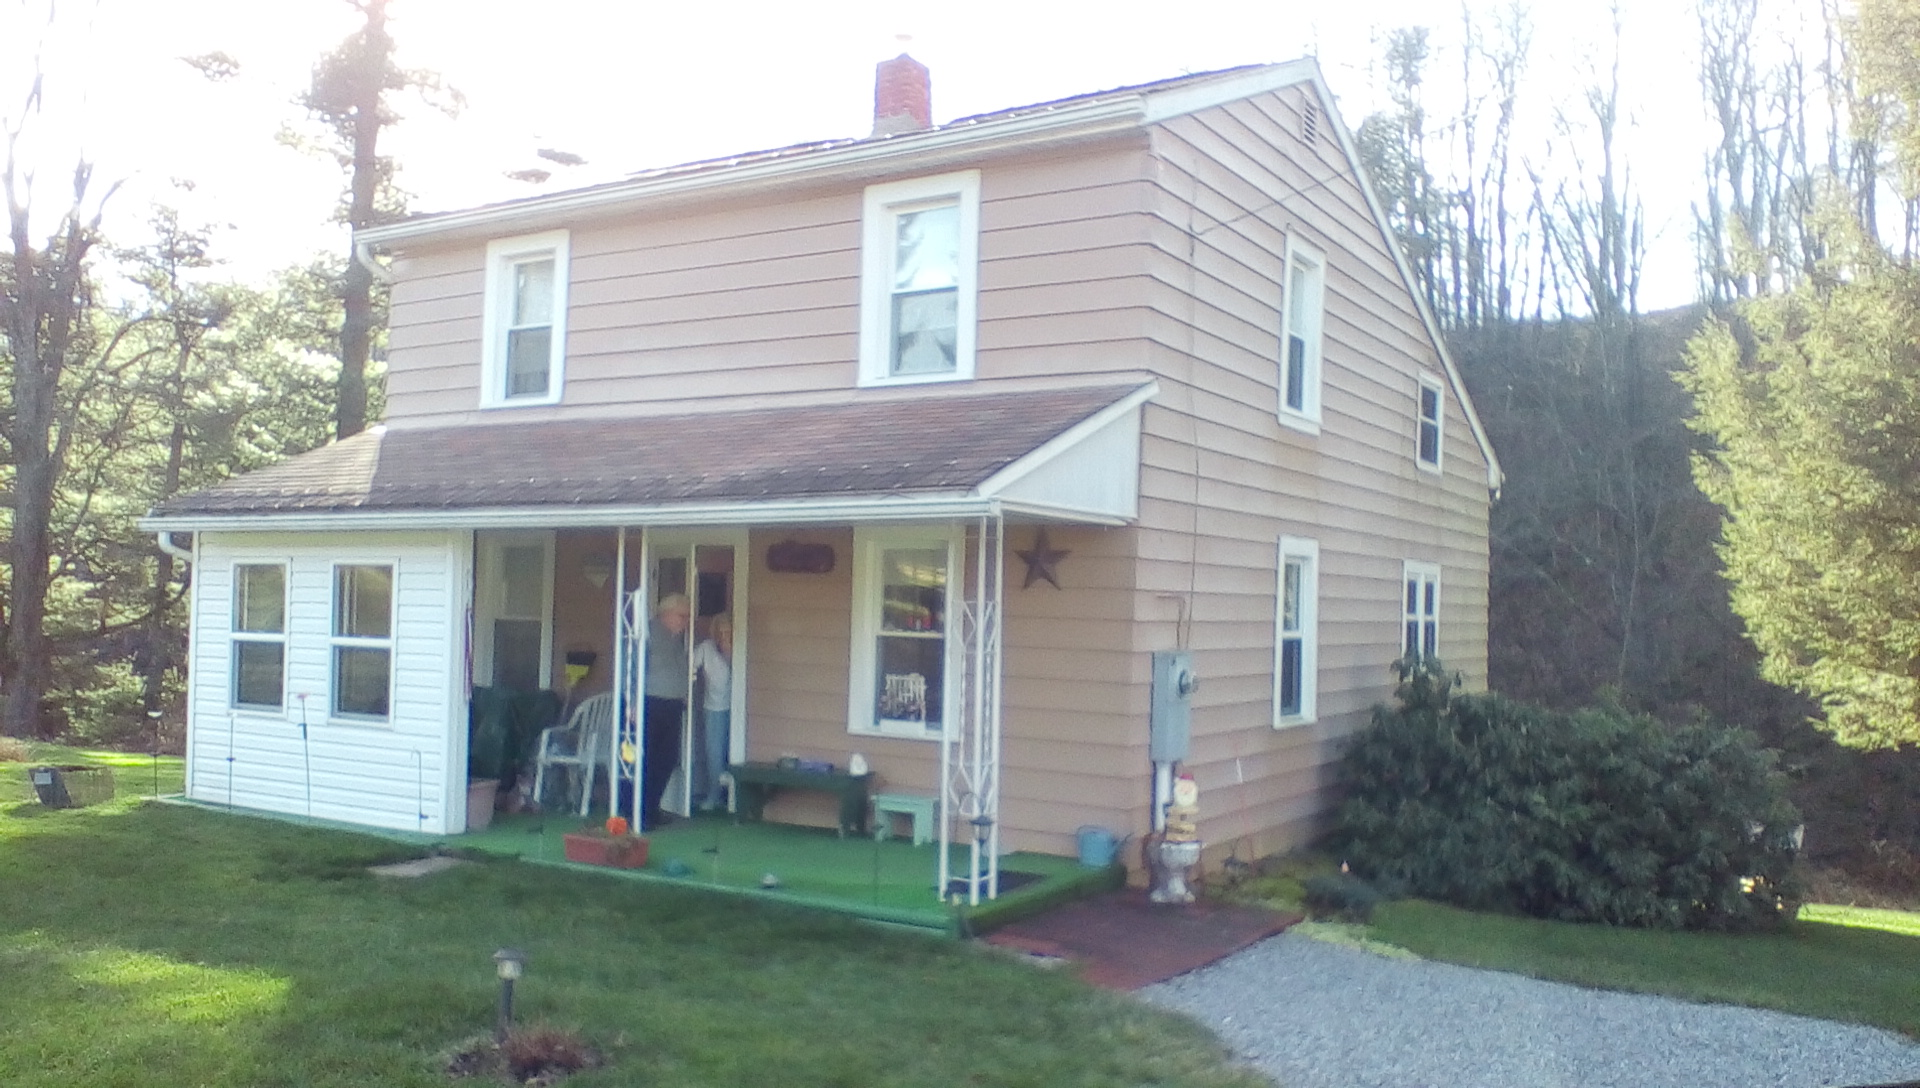 Original Krause house (2015) Cove, MD